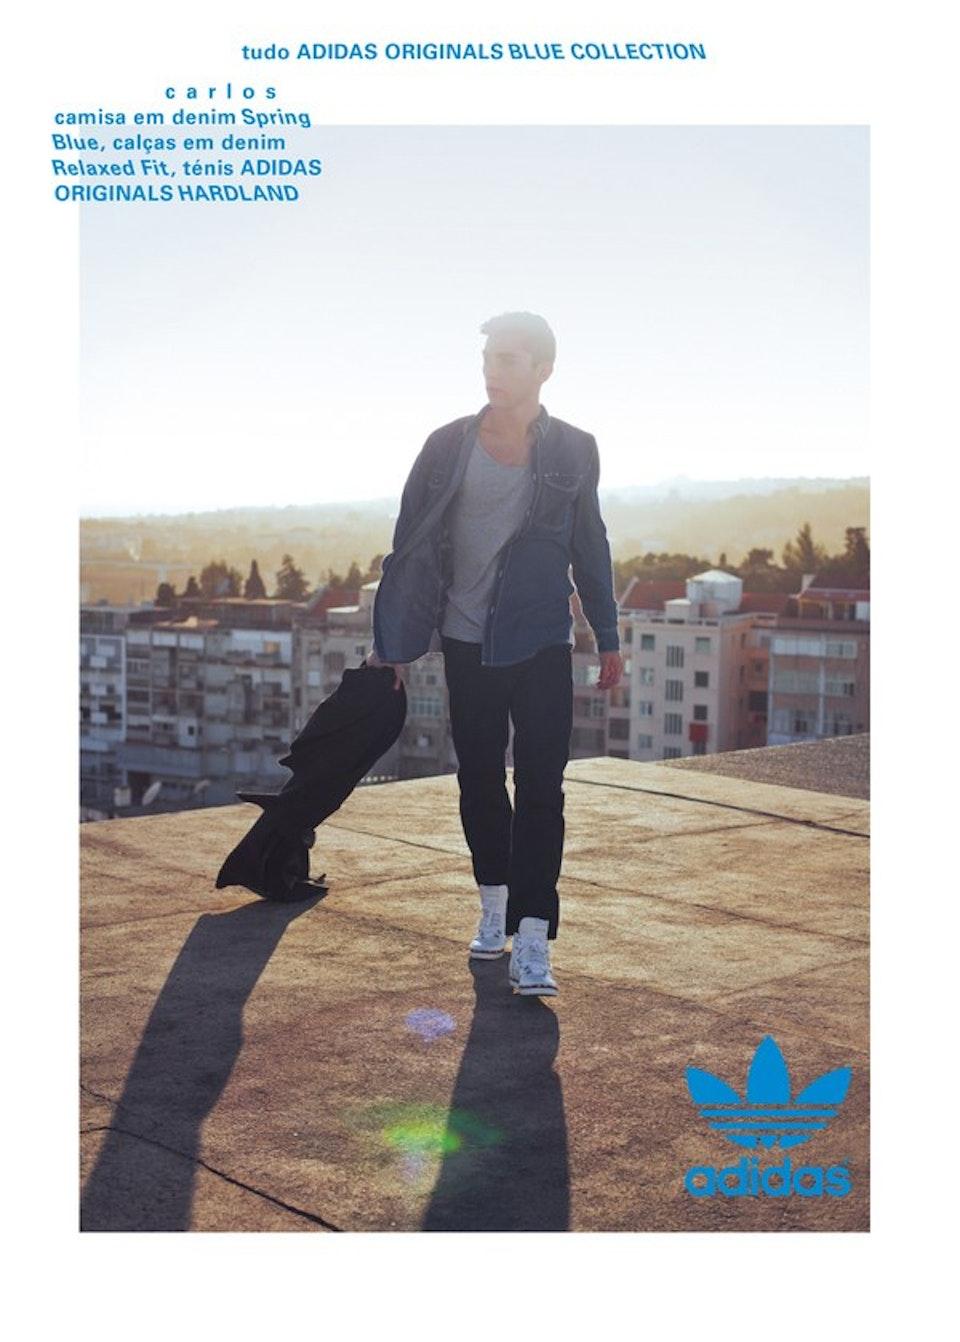 'Adidas' - Parq Magazine 04